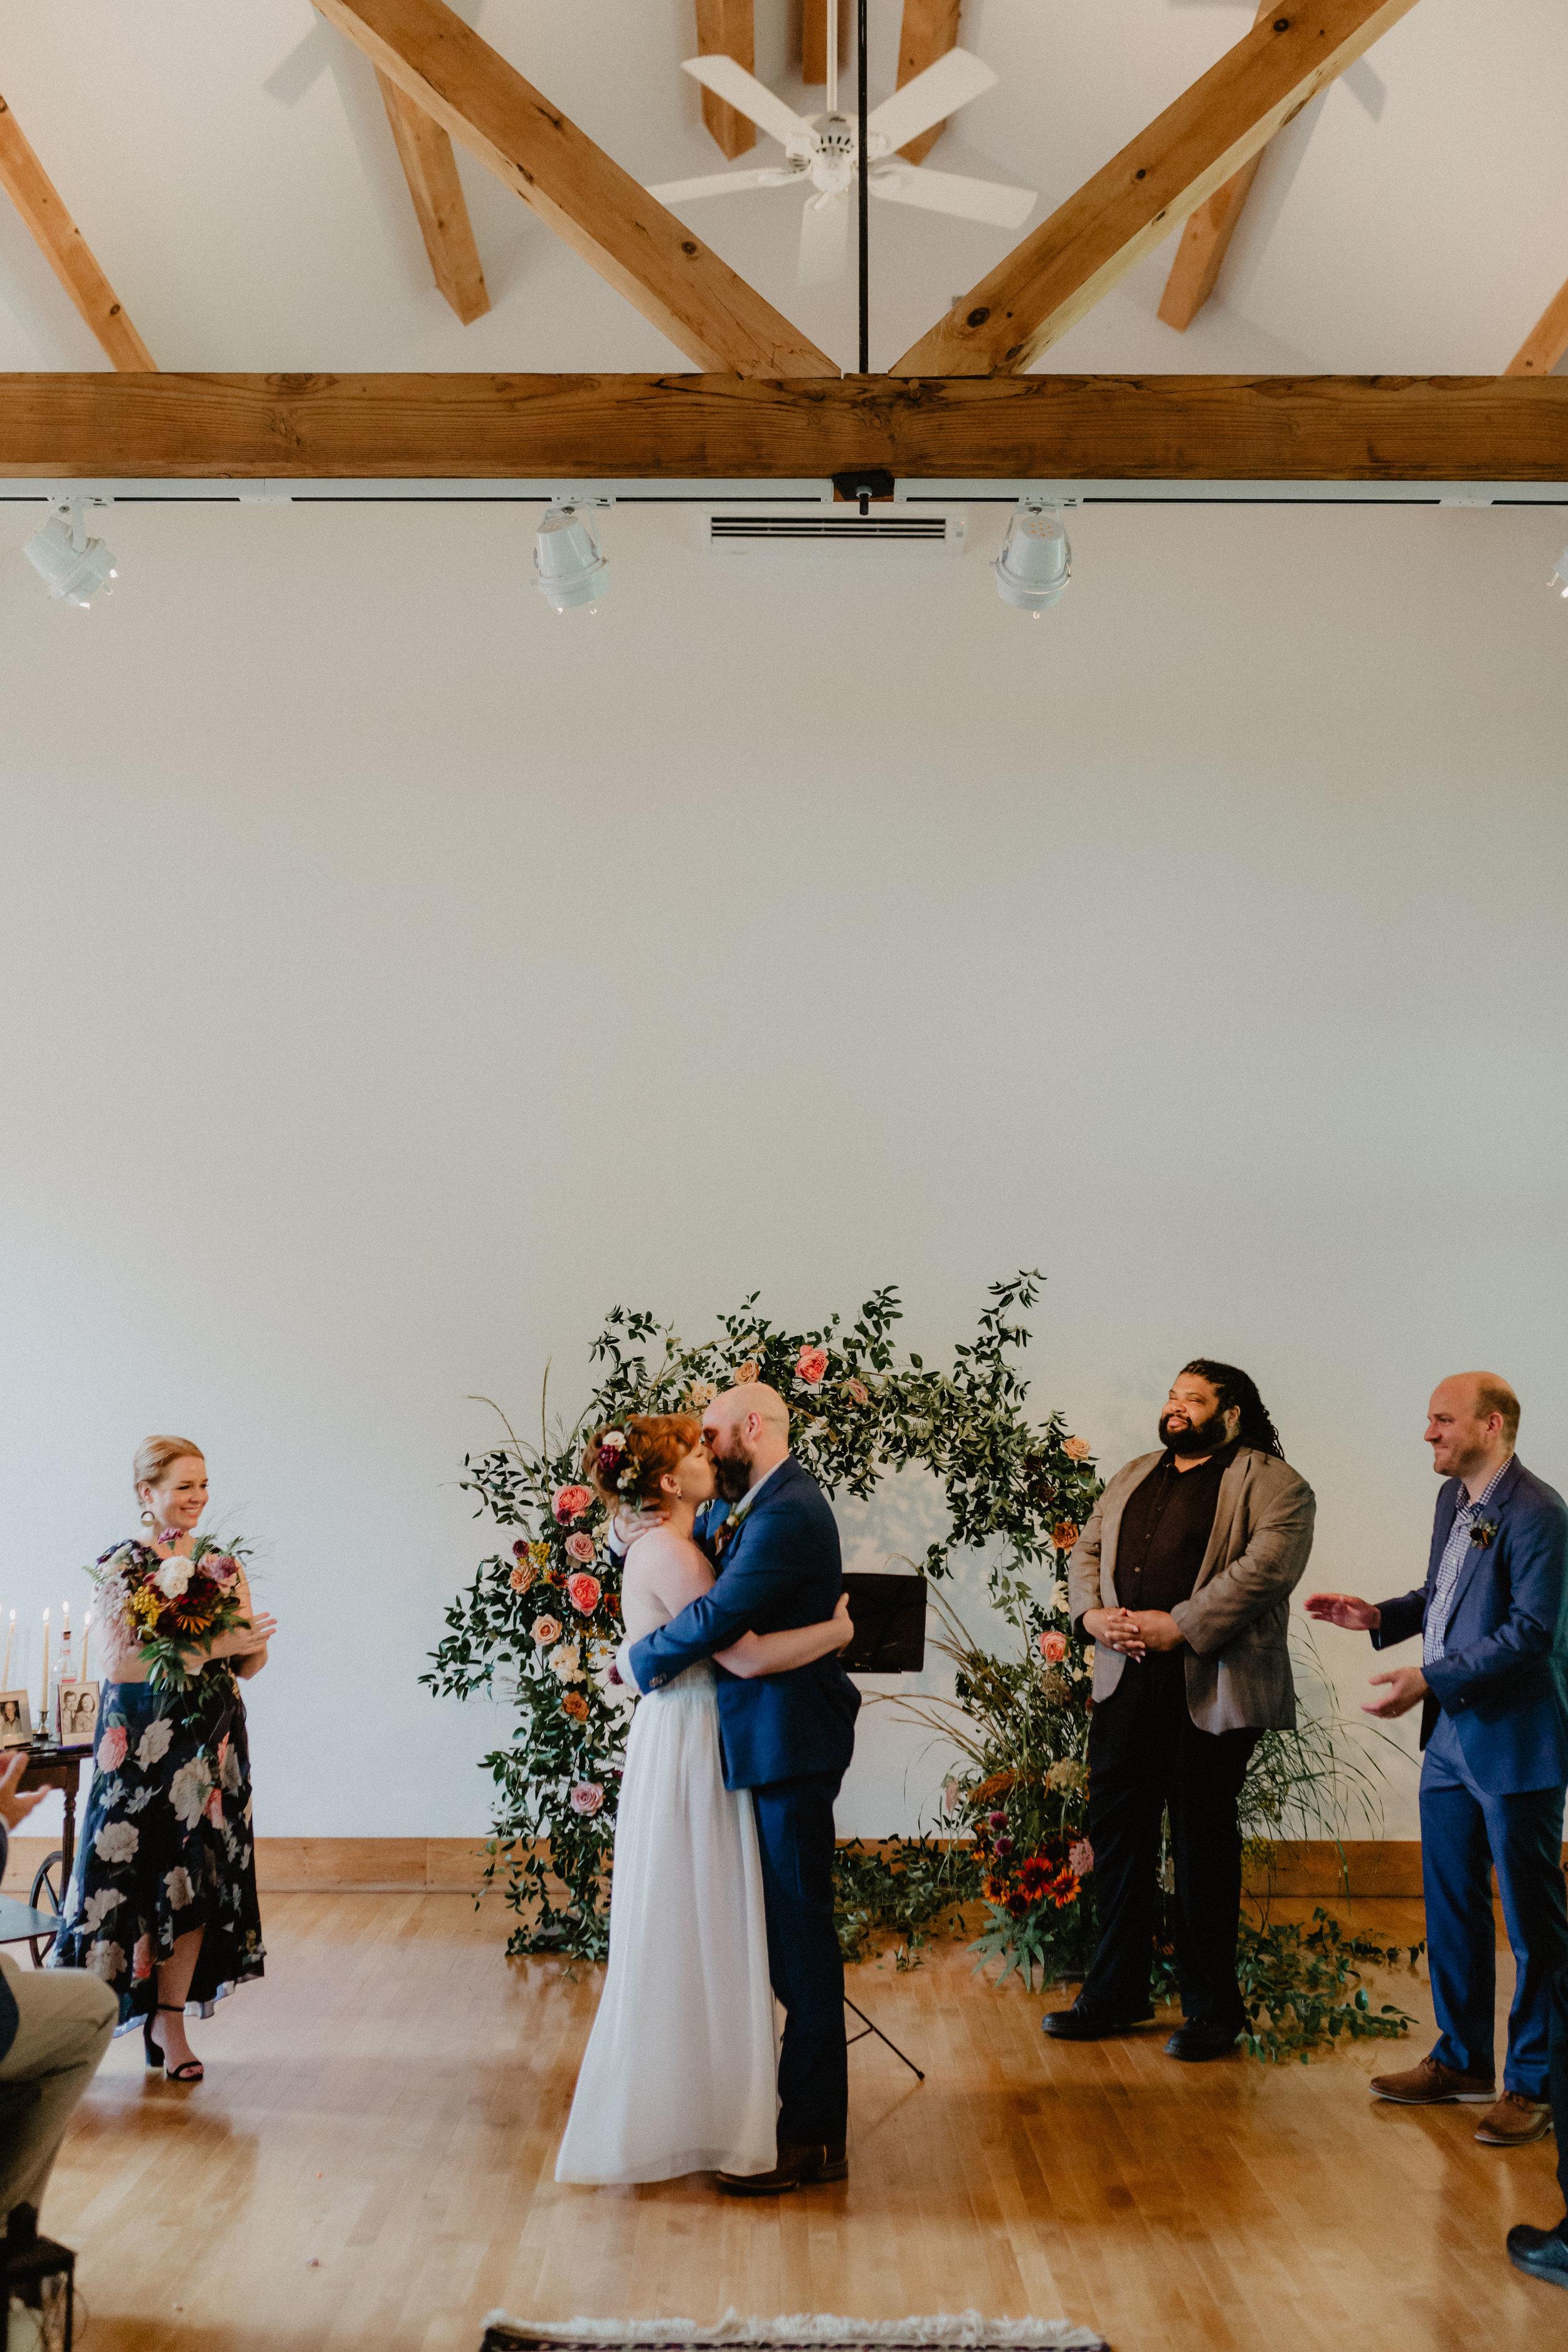 mount-tremper-arts-wedding057.jpg